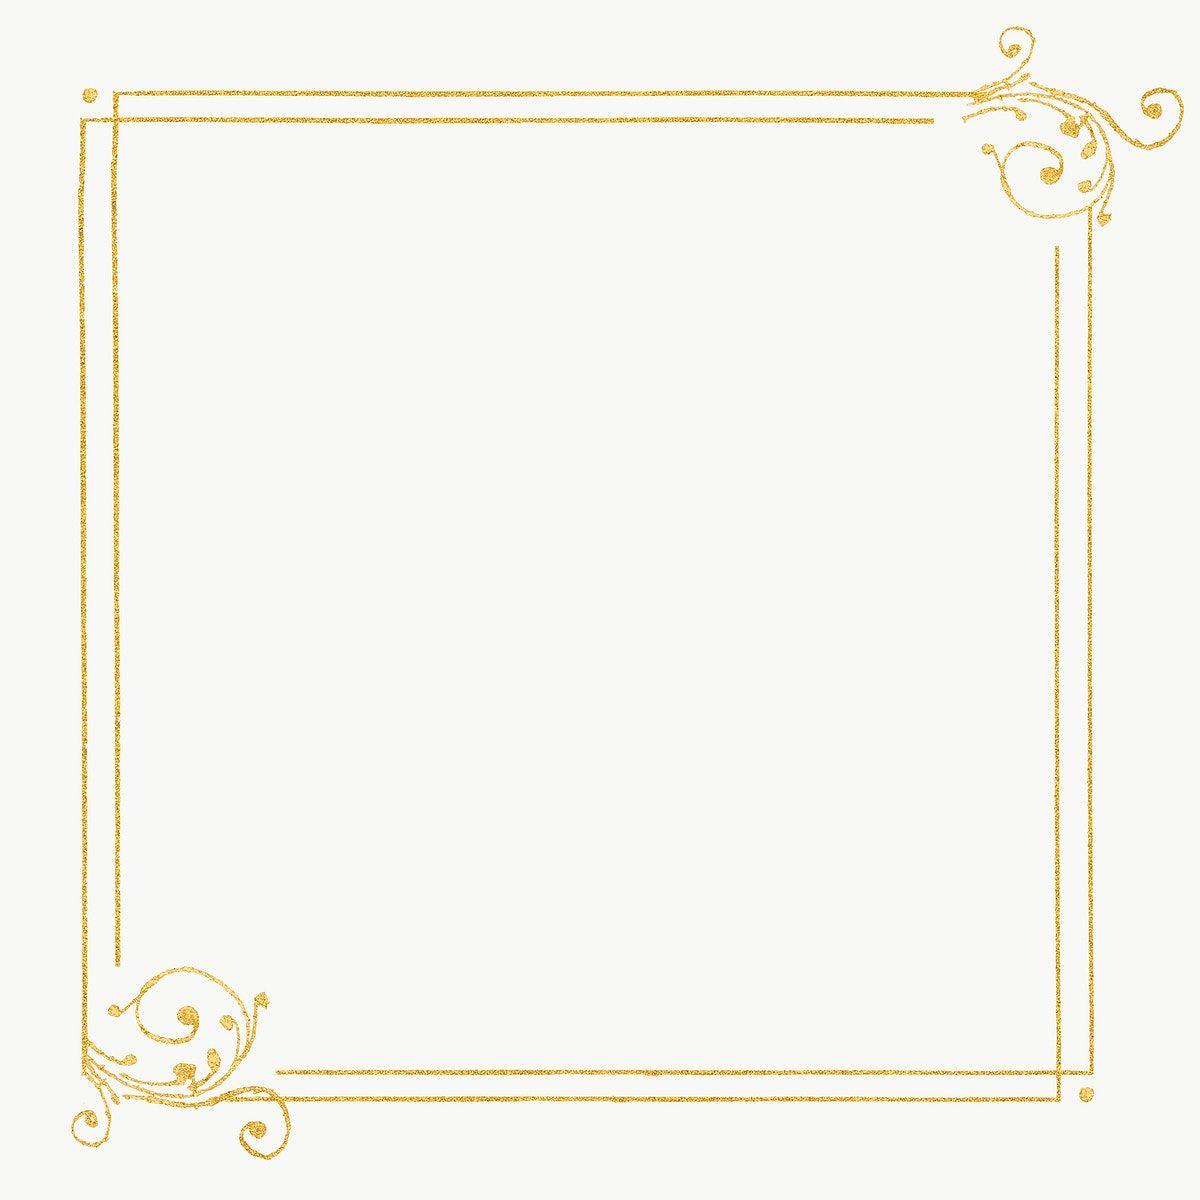 Gold Filigree Frame Border Png Free Image By Rawpixel Com Hwangmangjoo Victorian Frame Antique Artwork Frame